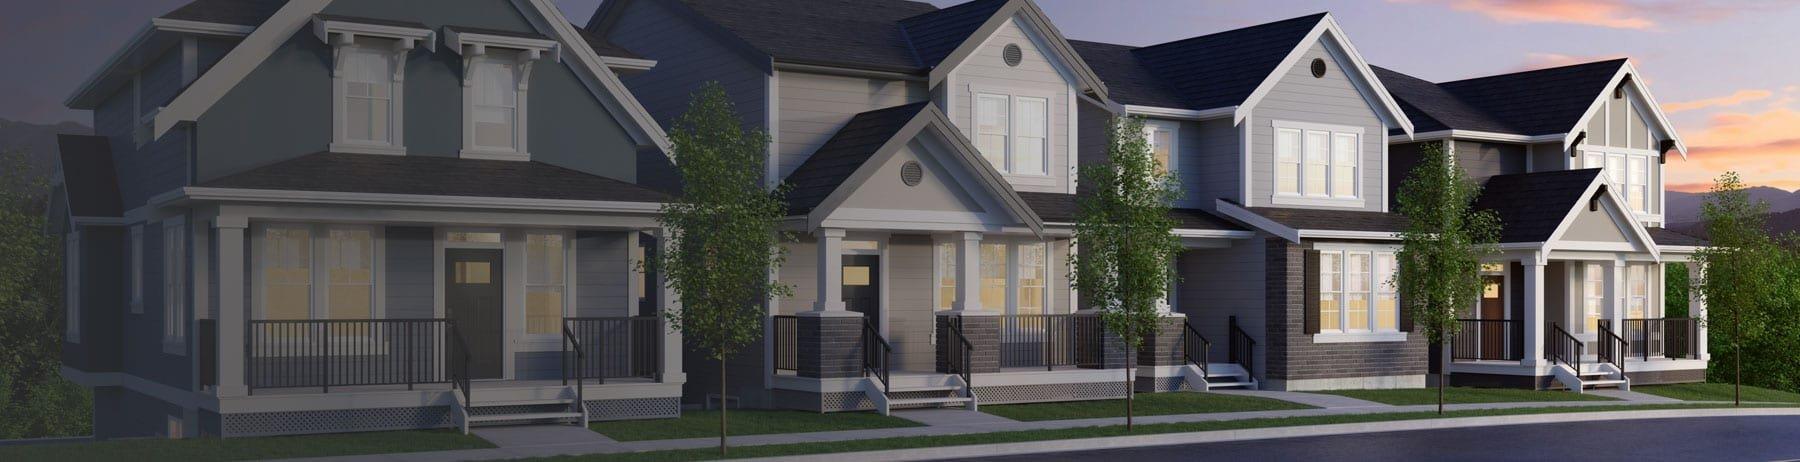 Exterior - Single Family Lane Homes!